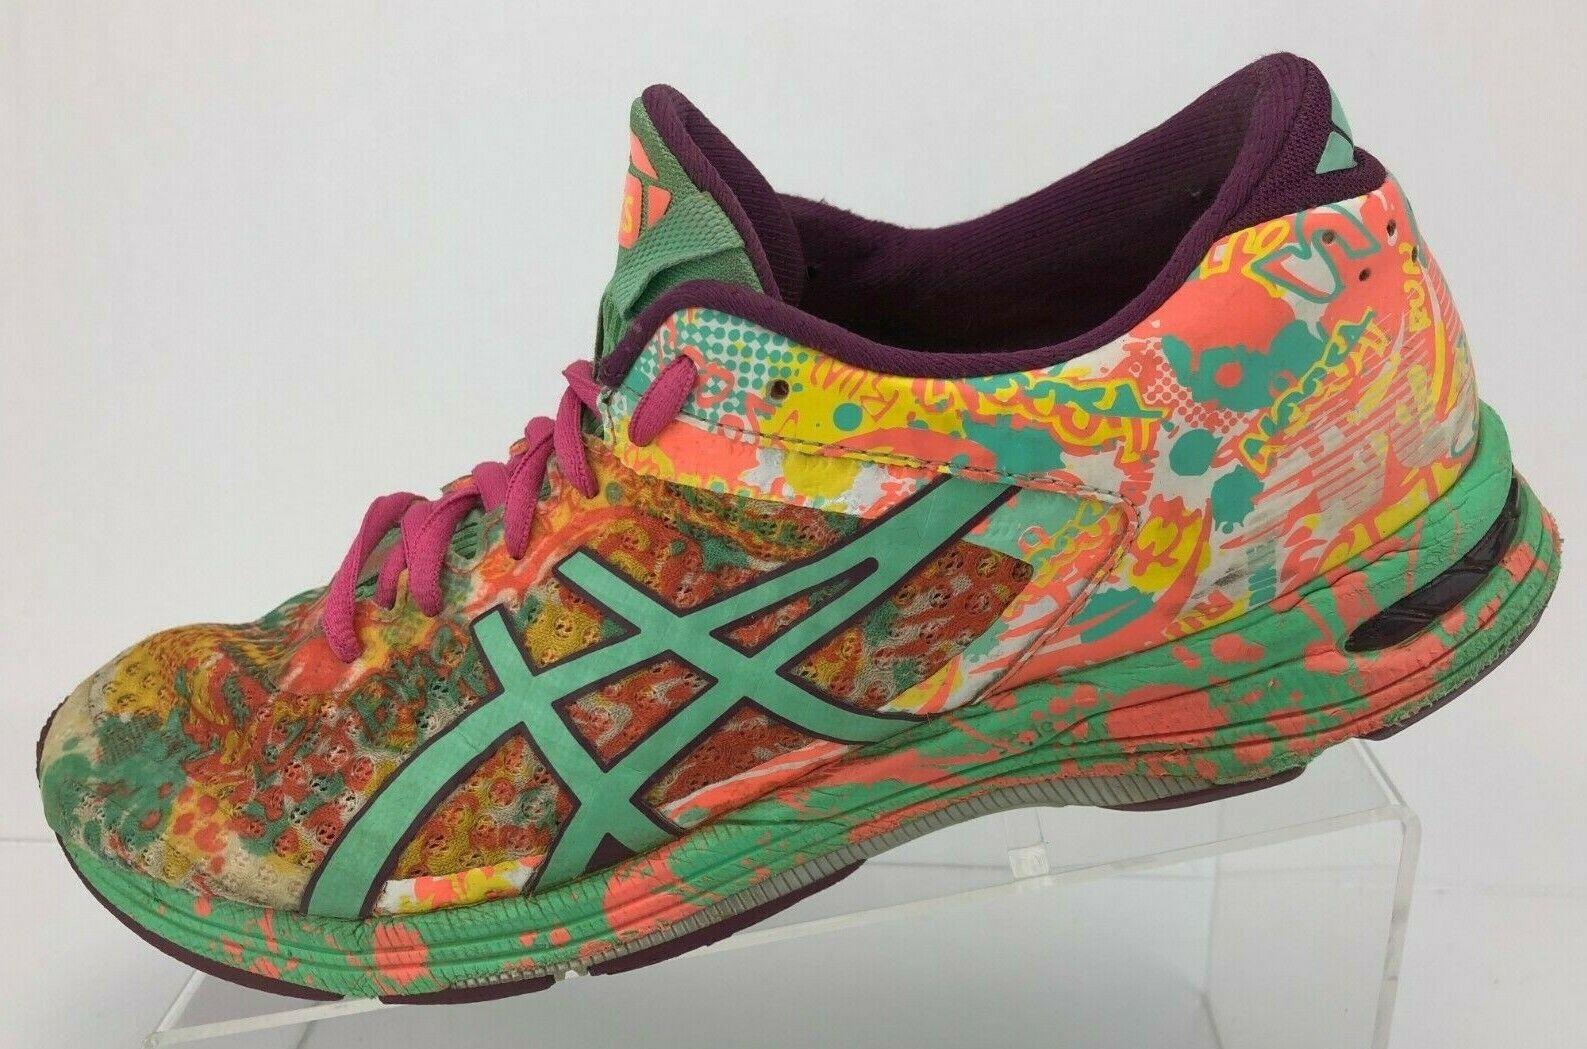 Asics GEL Noosa Tri 11 Running scarpe scarpe scarpe Multicolore Training Athletic donna Dimensione 11 0cb075